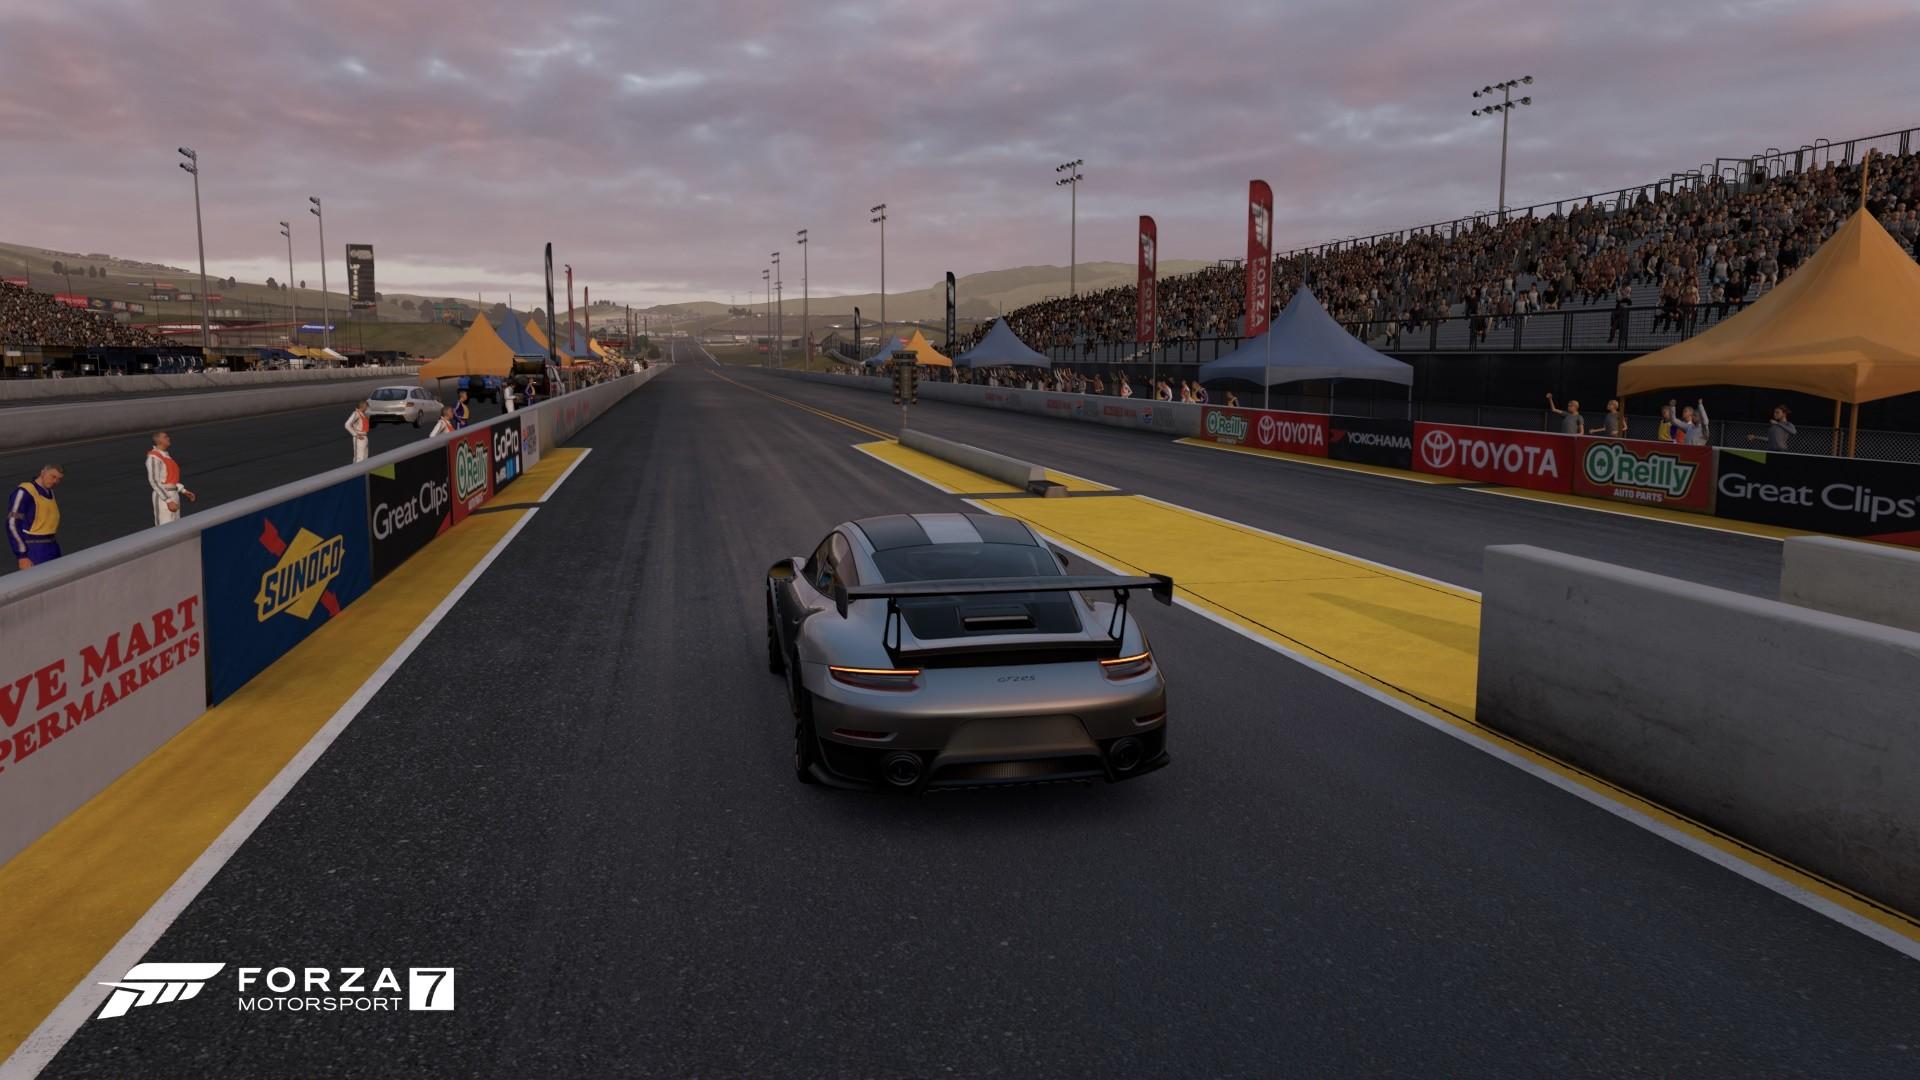 ArtStation - Forza Motorsport 7, Rogelio Delgado